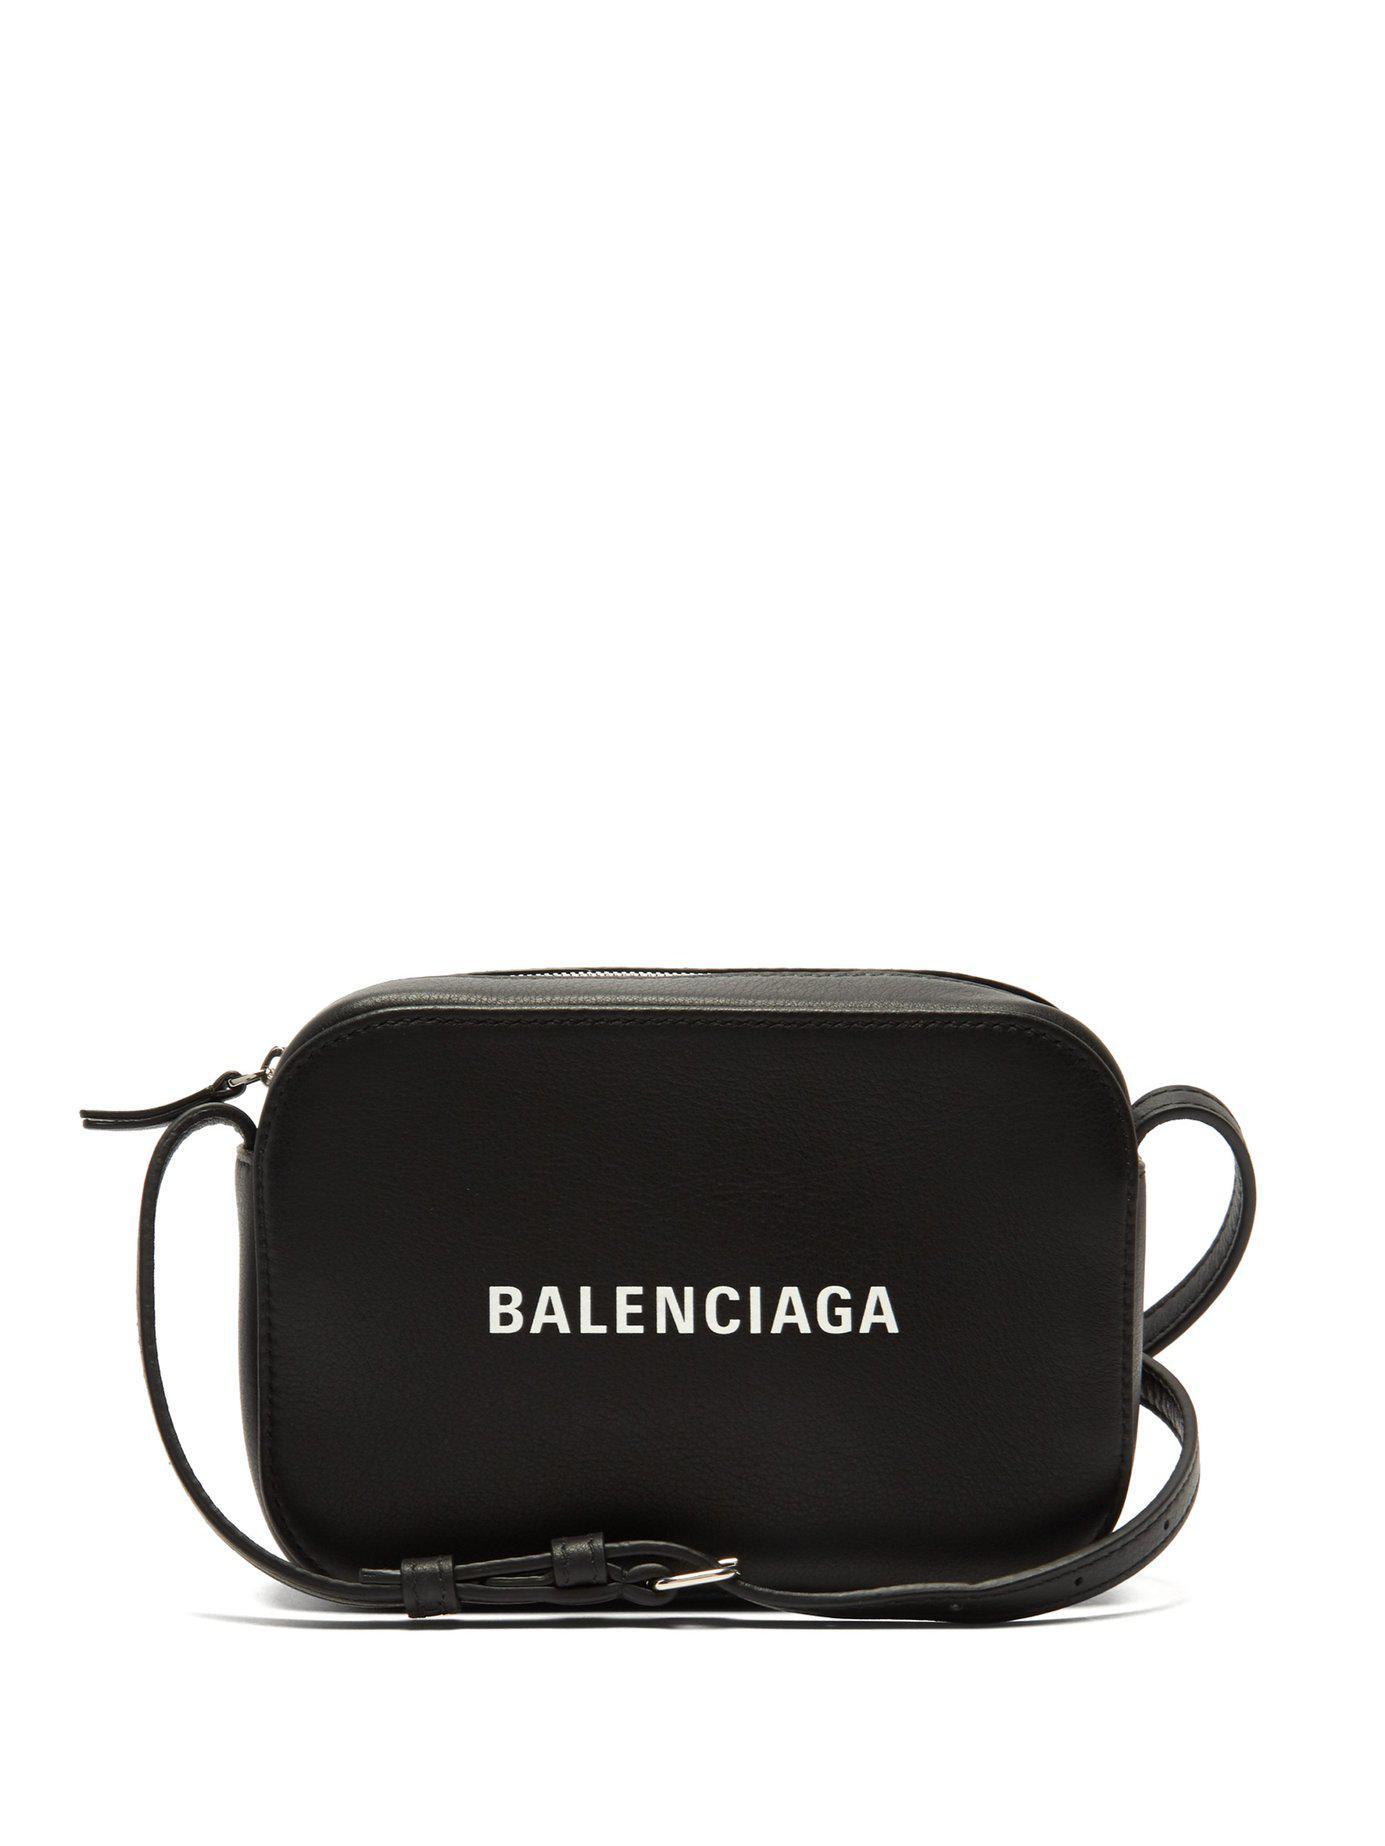 9091027b5234 Balenciaga - Black Everyday Camera Xs Cross Body Bag - Lyst. View fullscreen